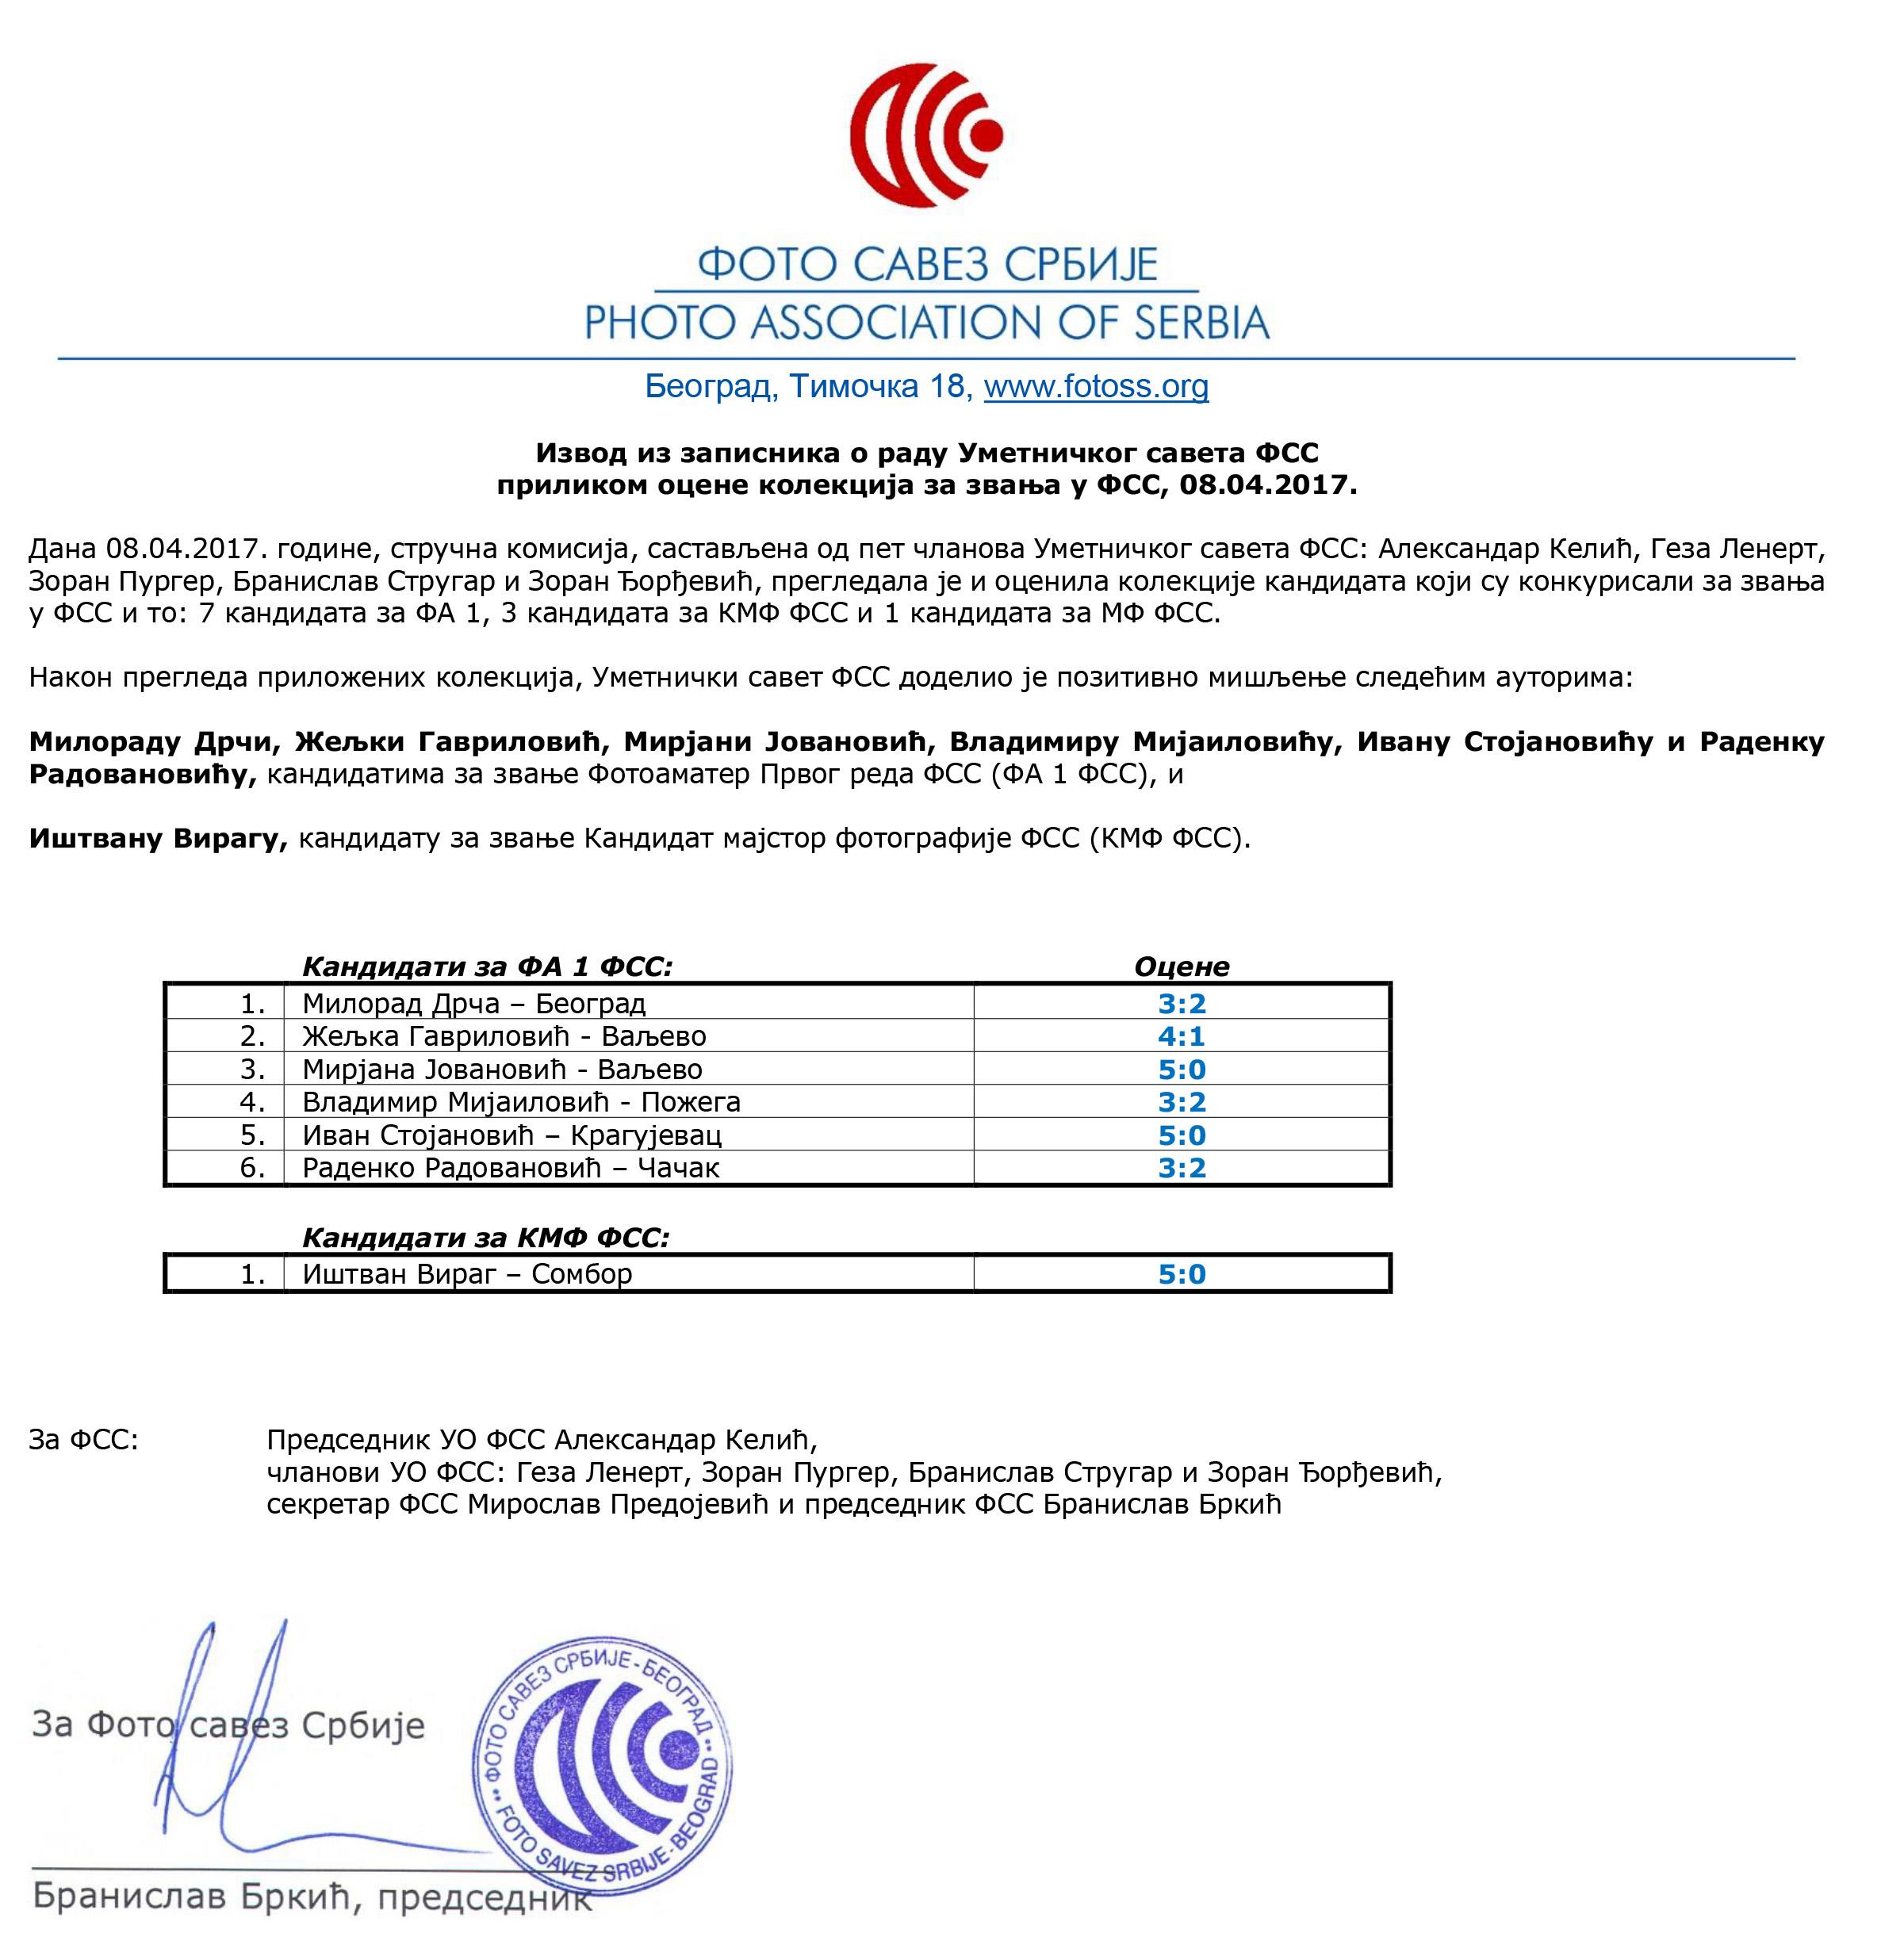 2017-04-08 Rezultati konkursa za zvanja - Pozitivne ocene